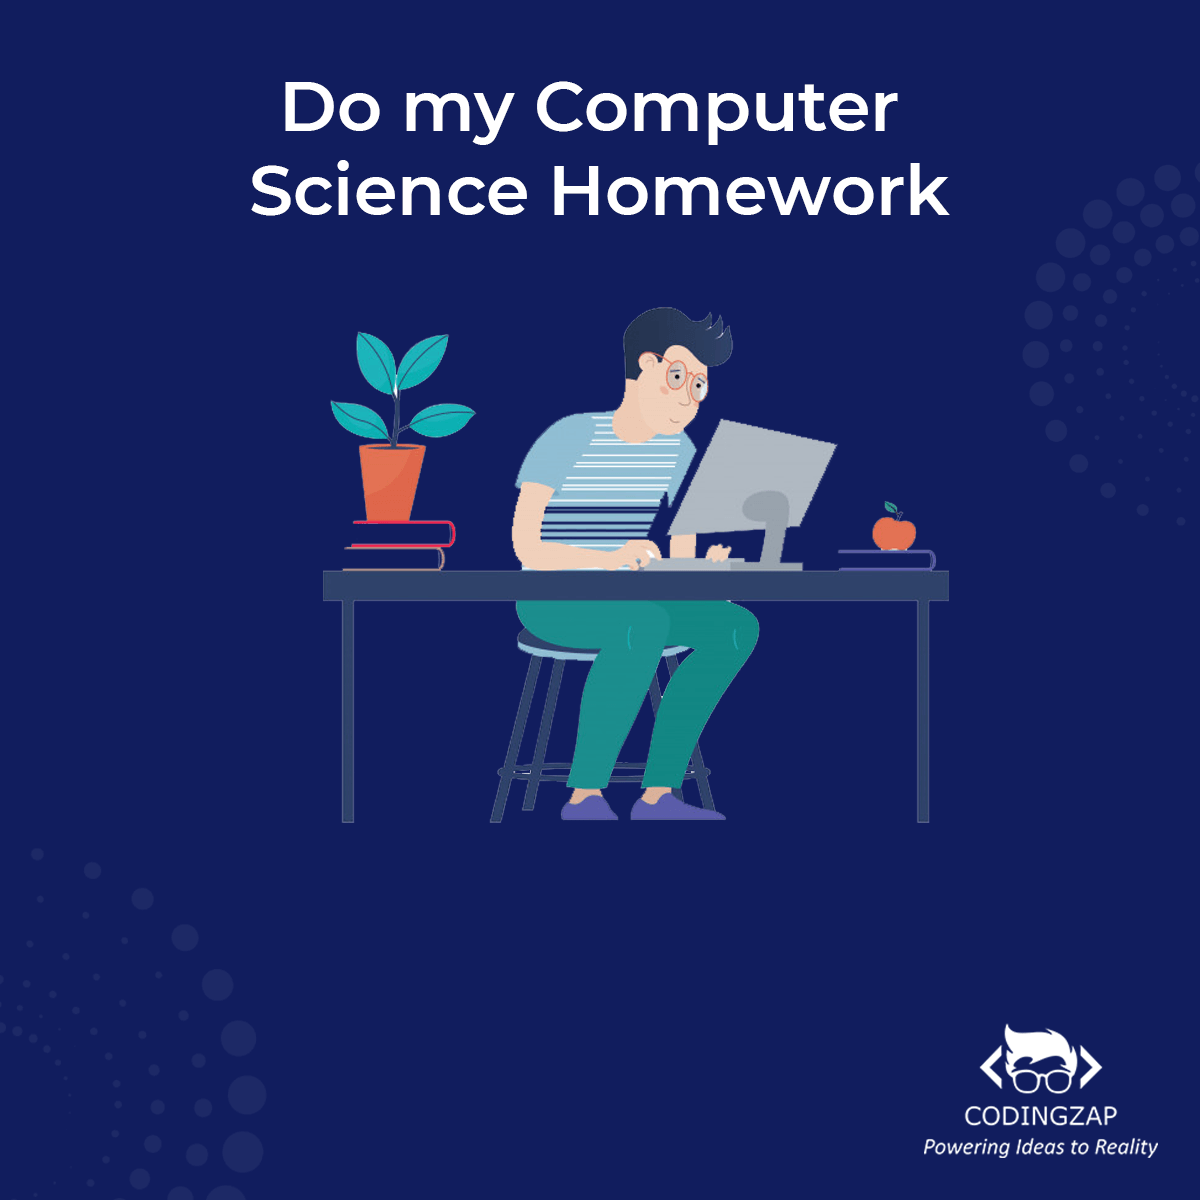 Do my Computer Science Homework